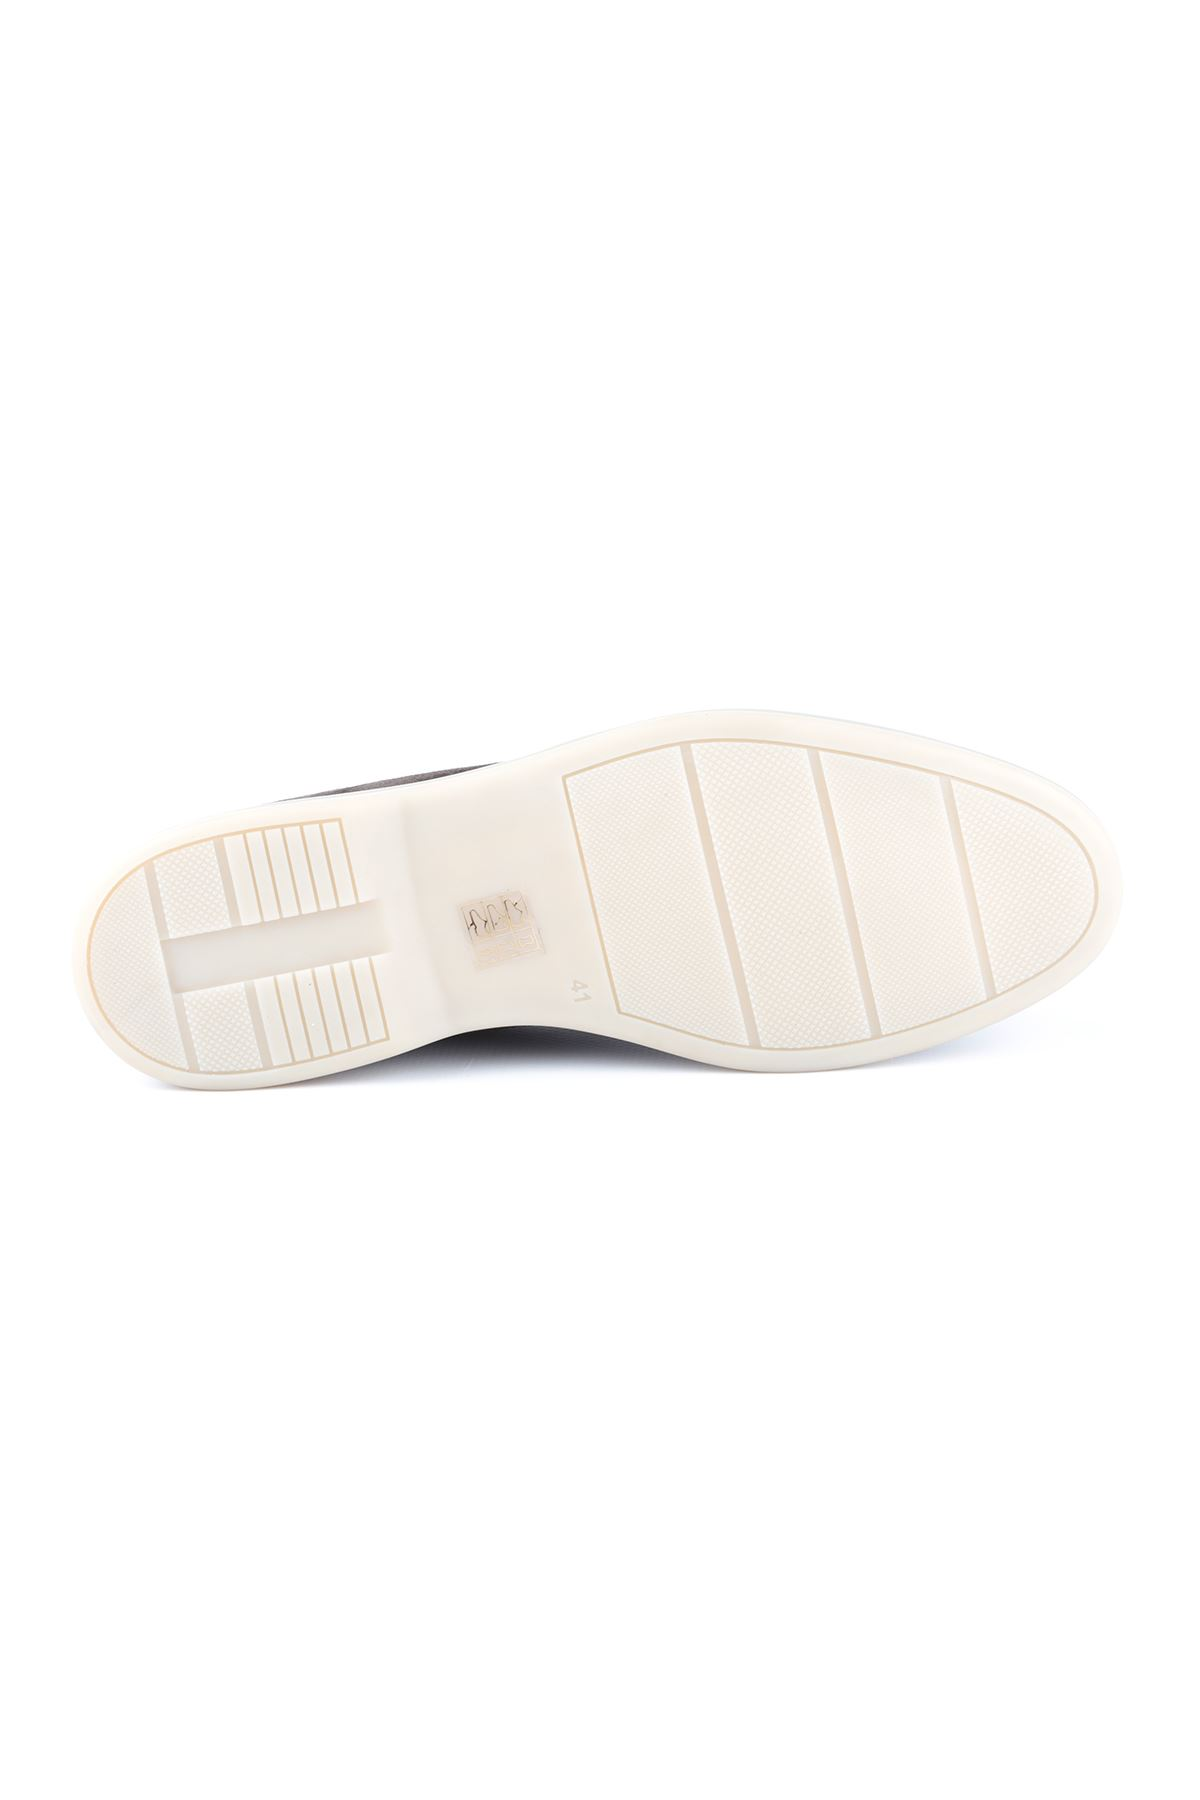 Libero T1403 Kahve Loafer Ayakkabı